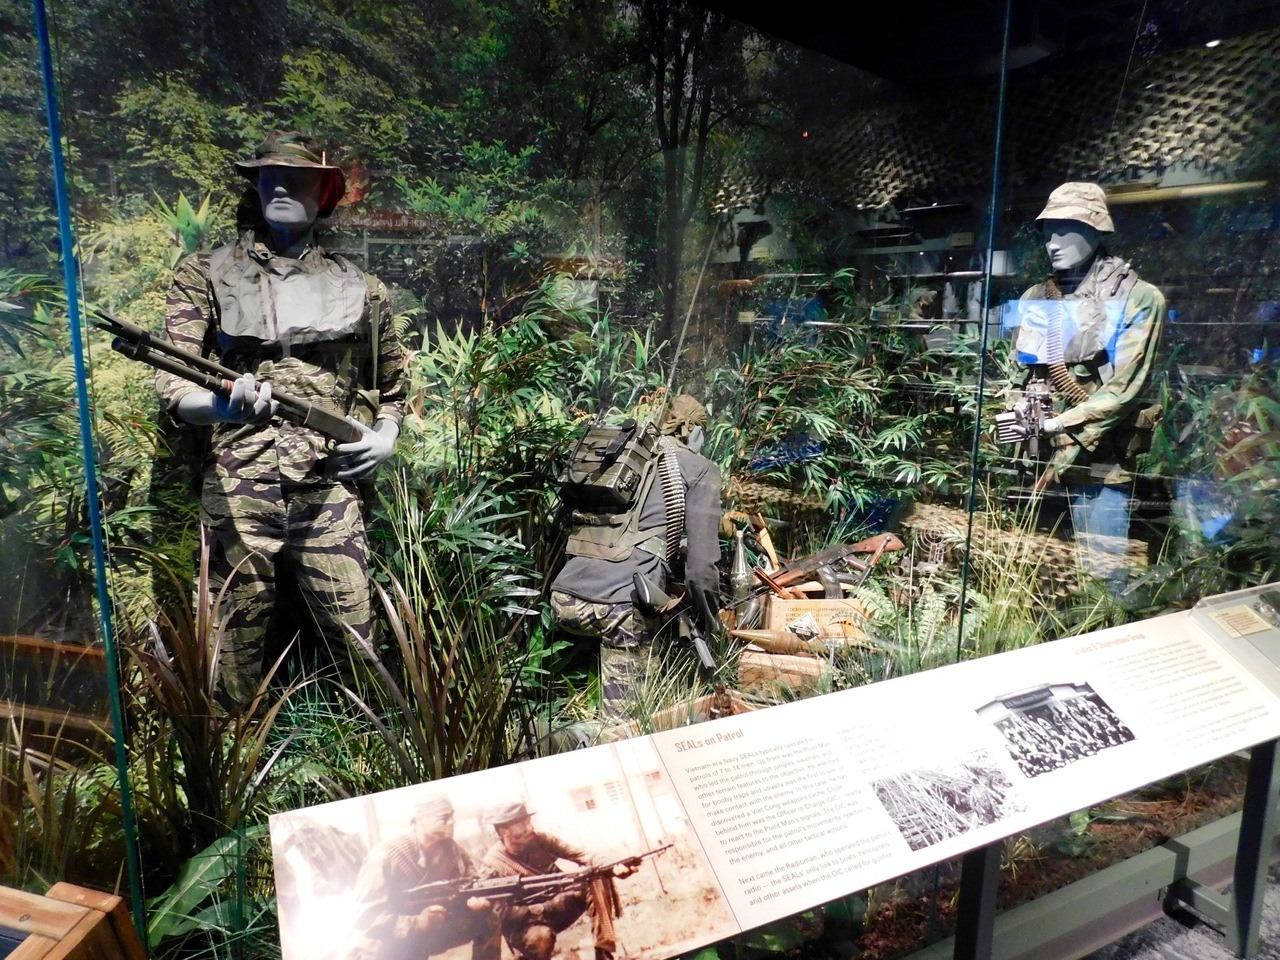 Navy Seal Museum de Fort Pierce / Floride